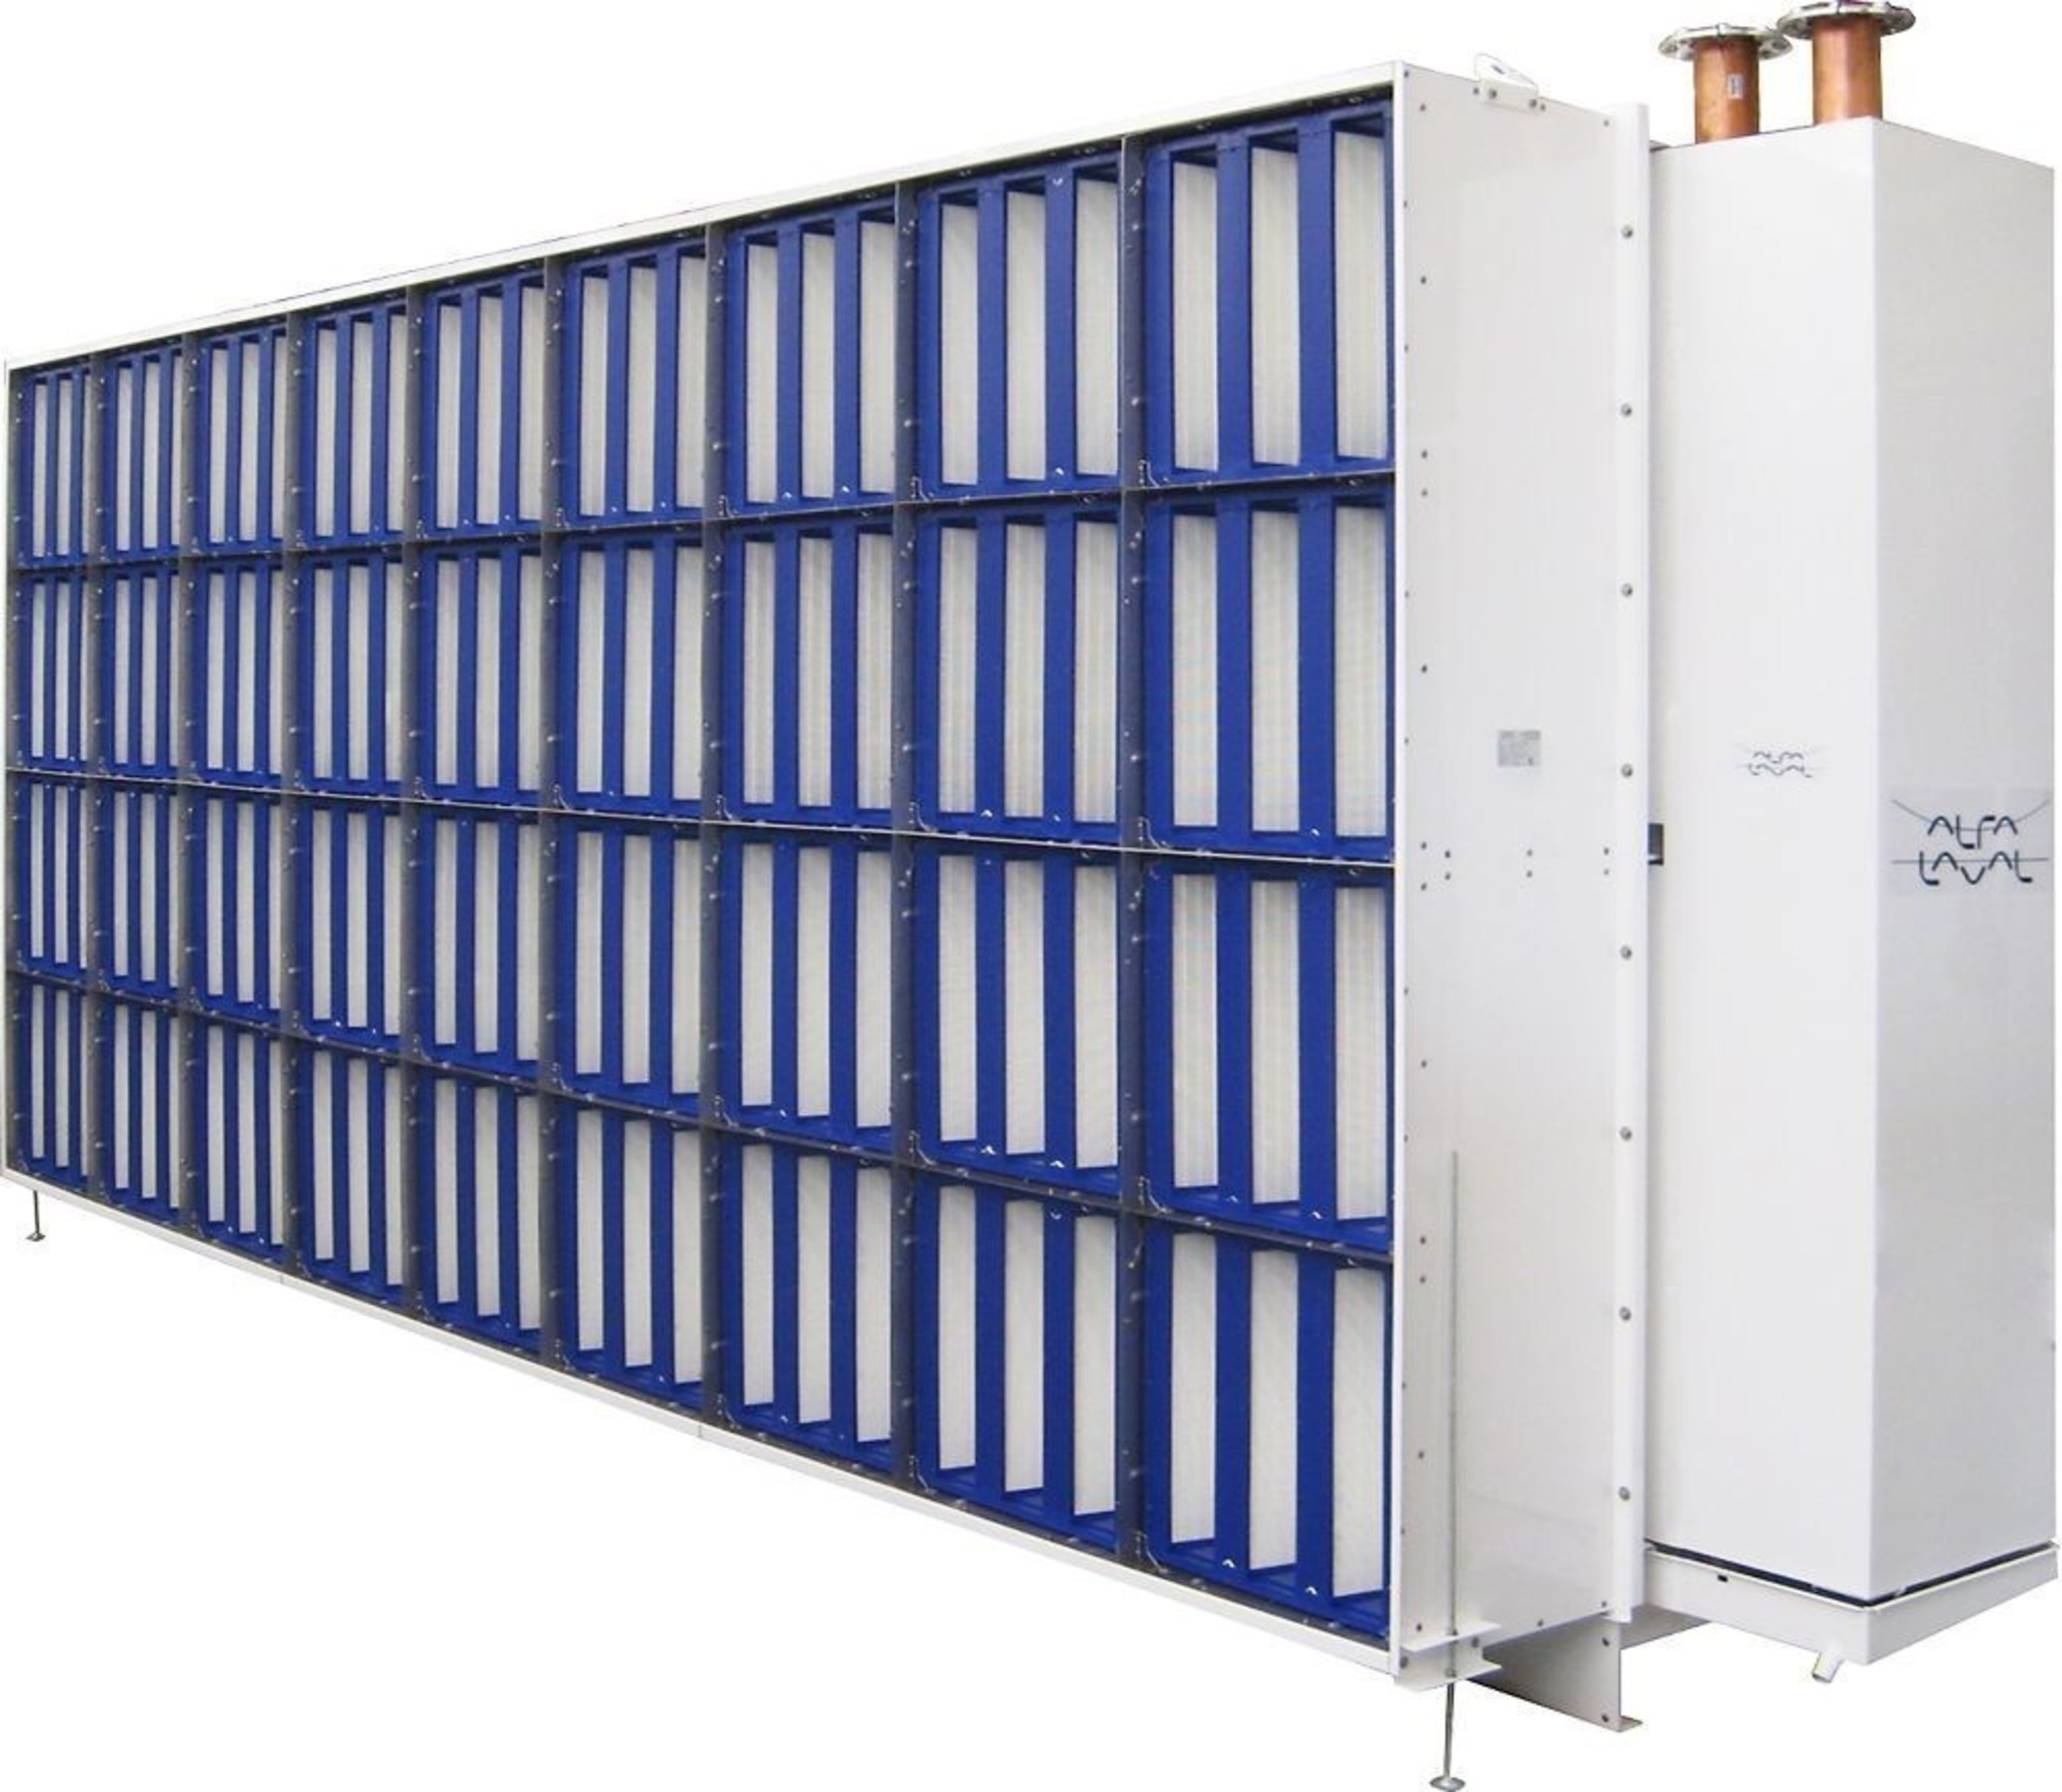 Low Speed Ventilation Delivers Highly Efficient Server Cooling